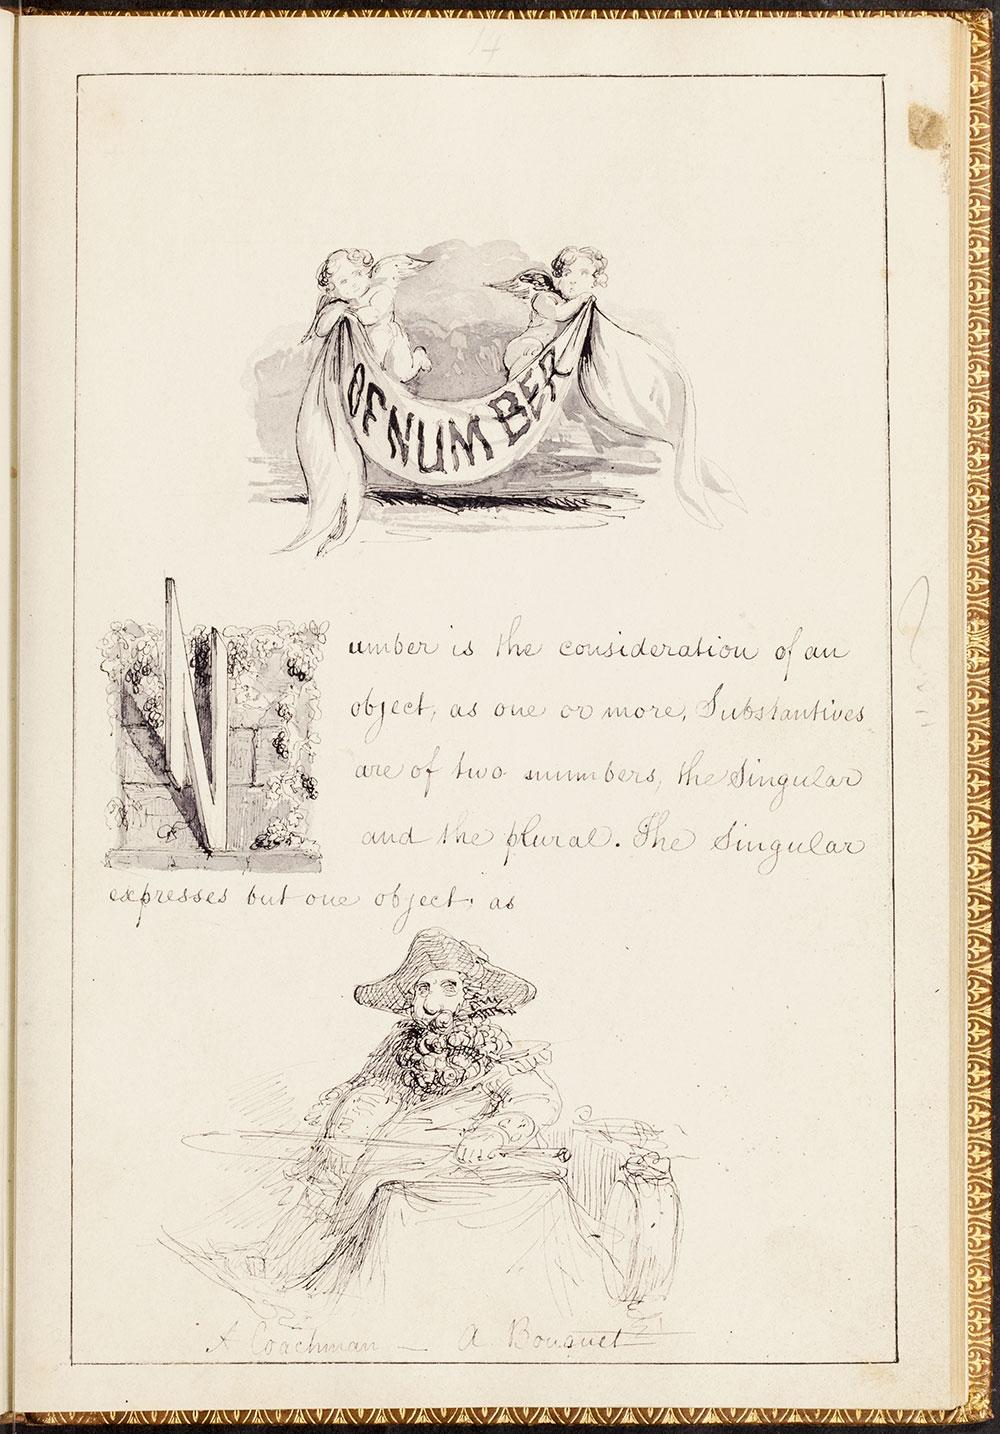 Alfred Crowquill. Original manuscript of The Pictorial Grammar. #1